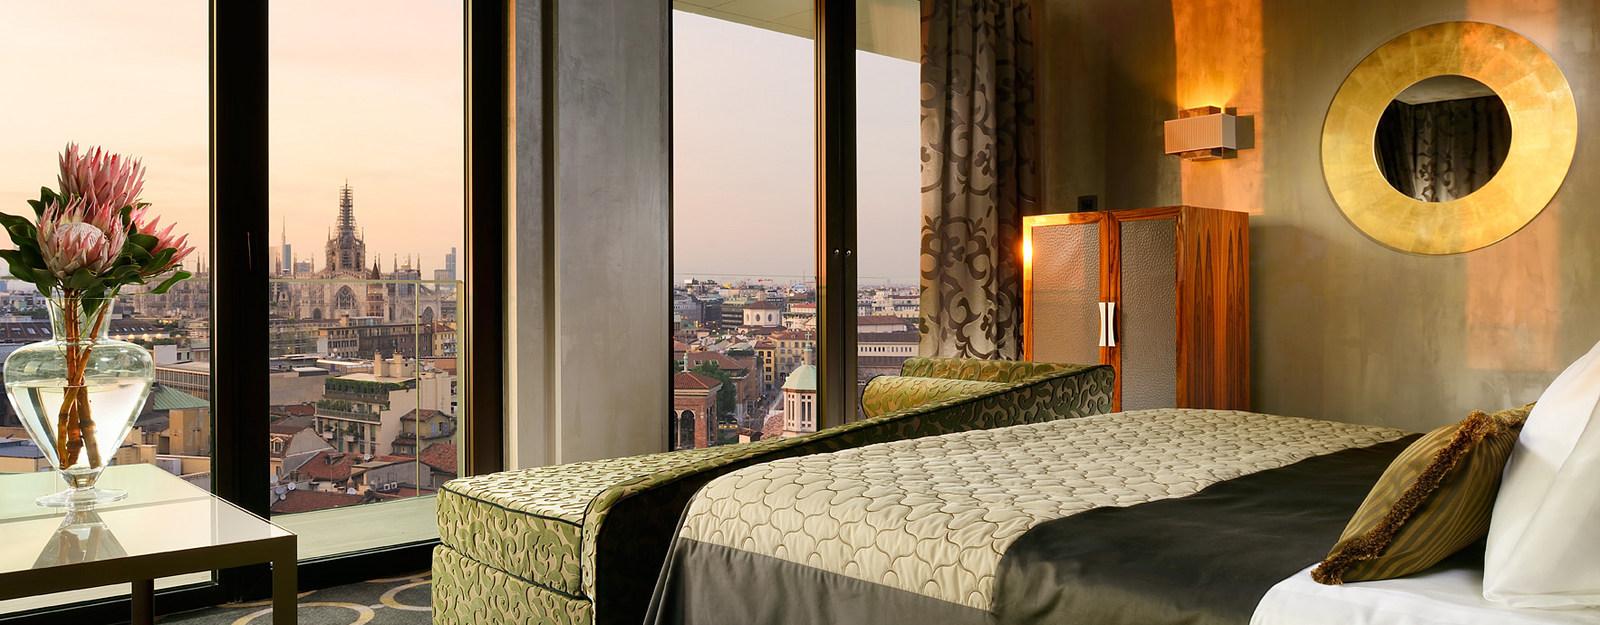 Uptown Palace Hotel - Milan Italy